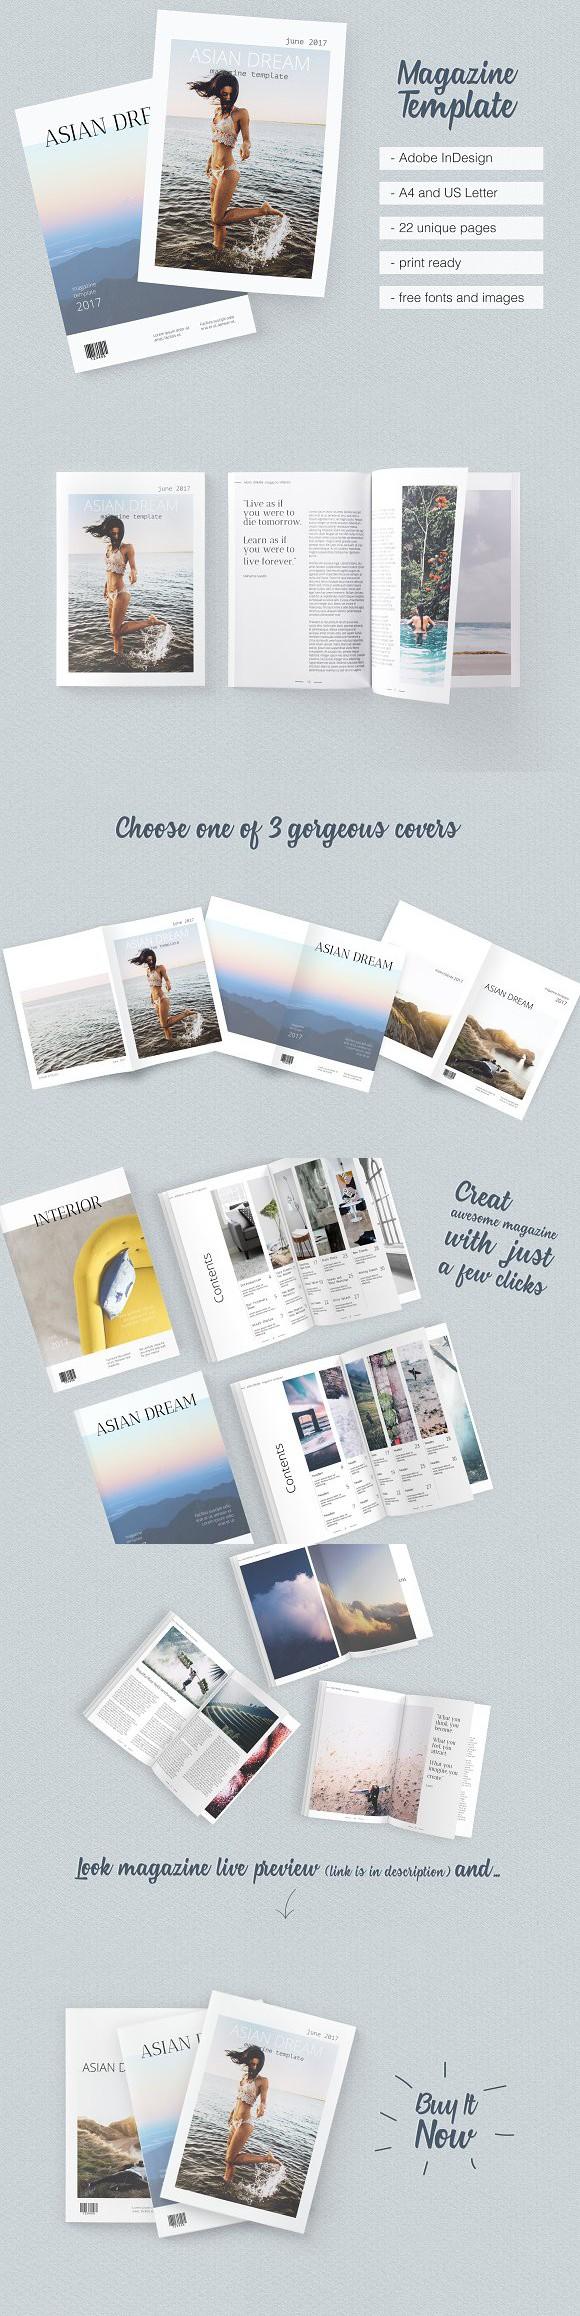 Asian Dream Magazine Template. Magazine Templates | Magazine ...